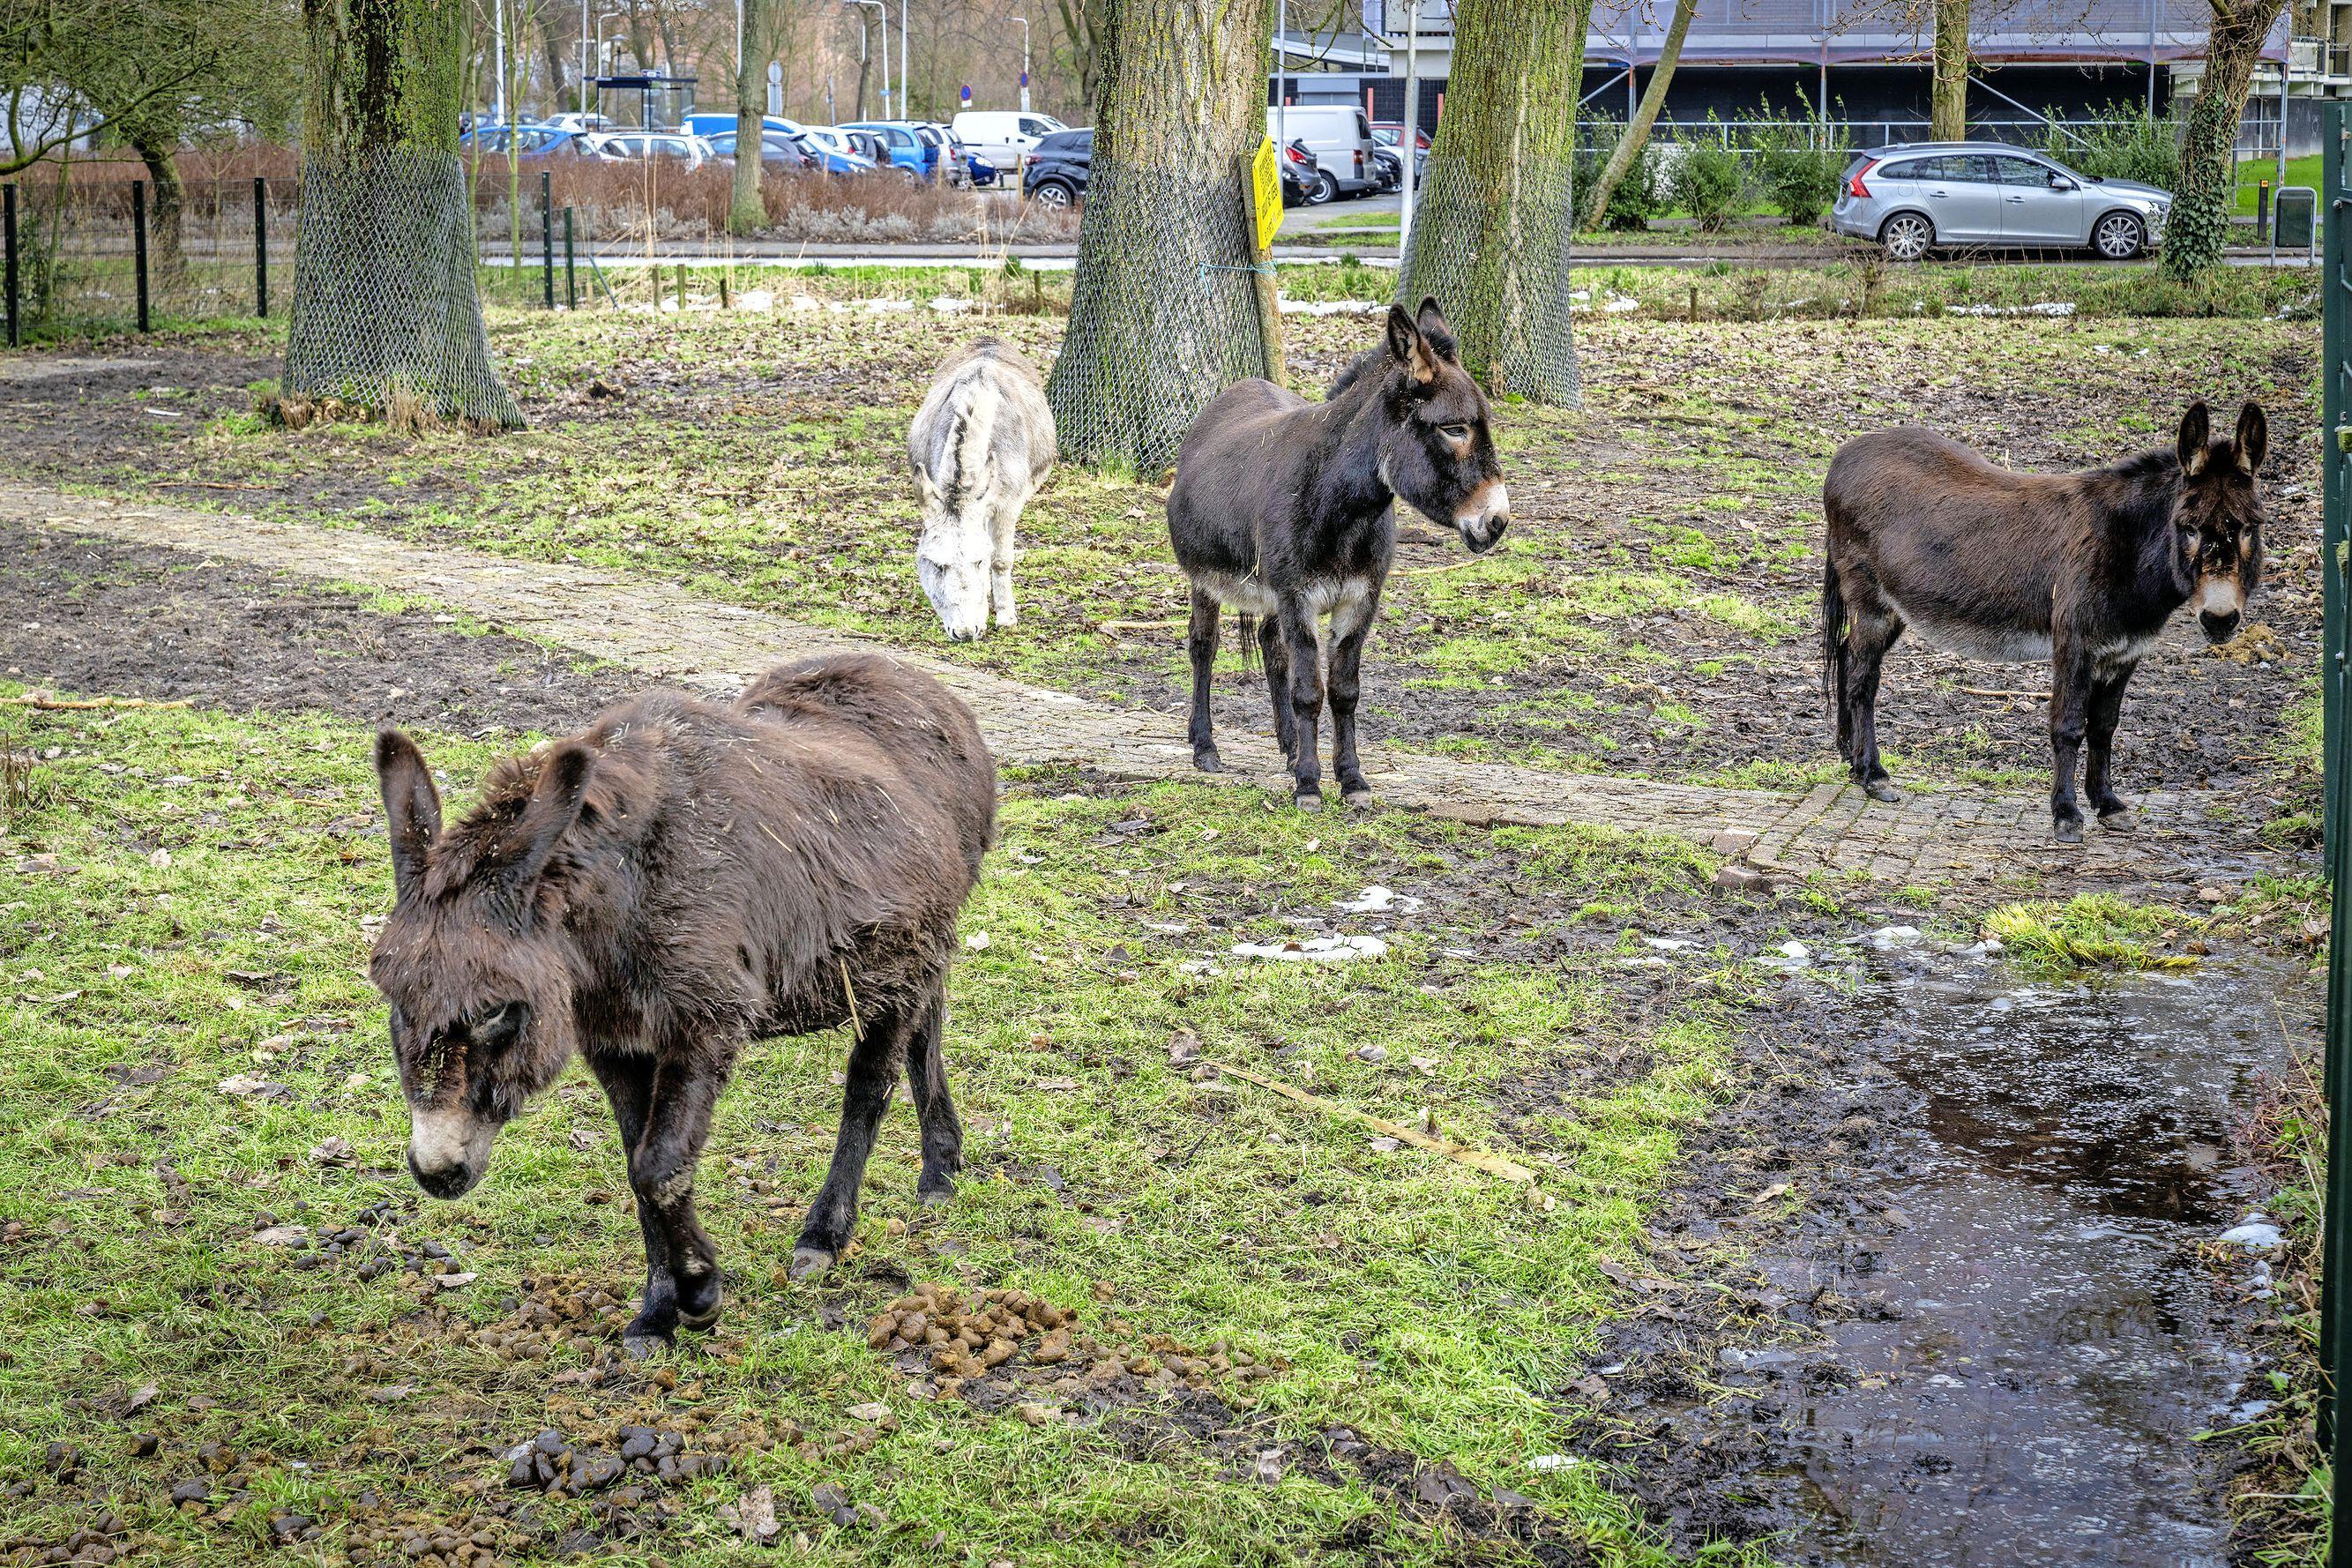 Vier ezels als kwartiermakers in vernieuwde, Leidse kinderboerderij Kweeklust